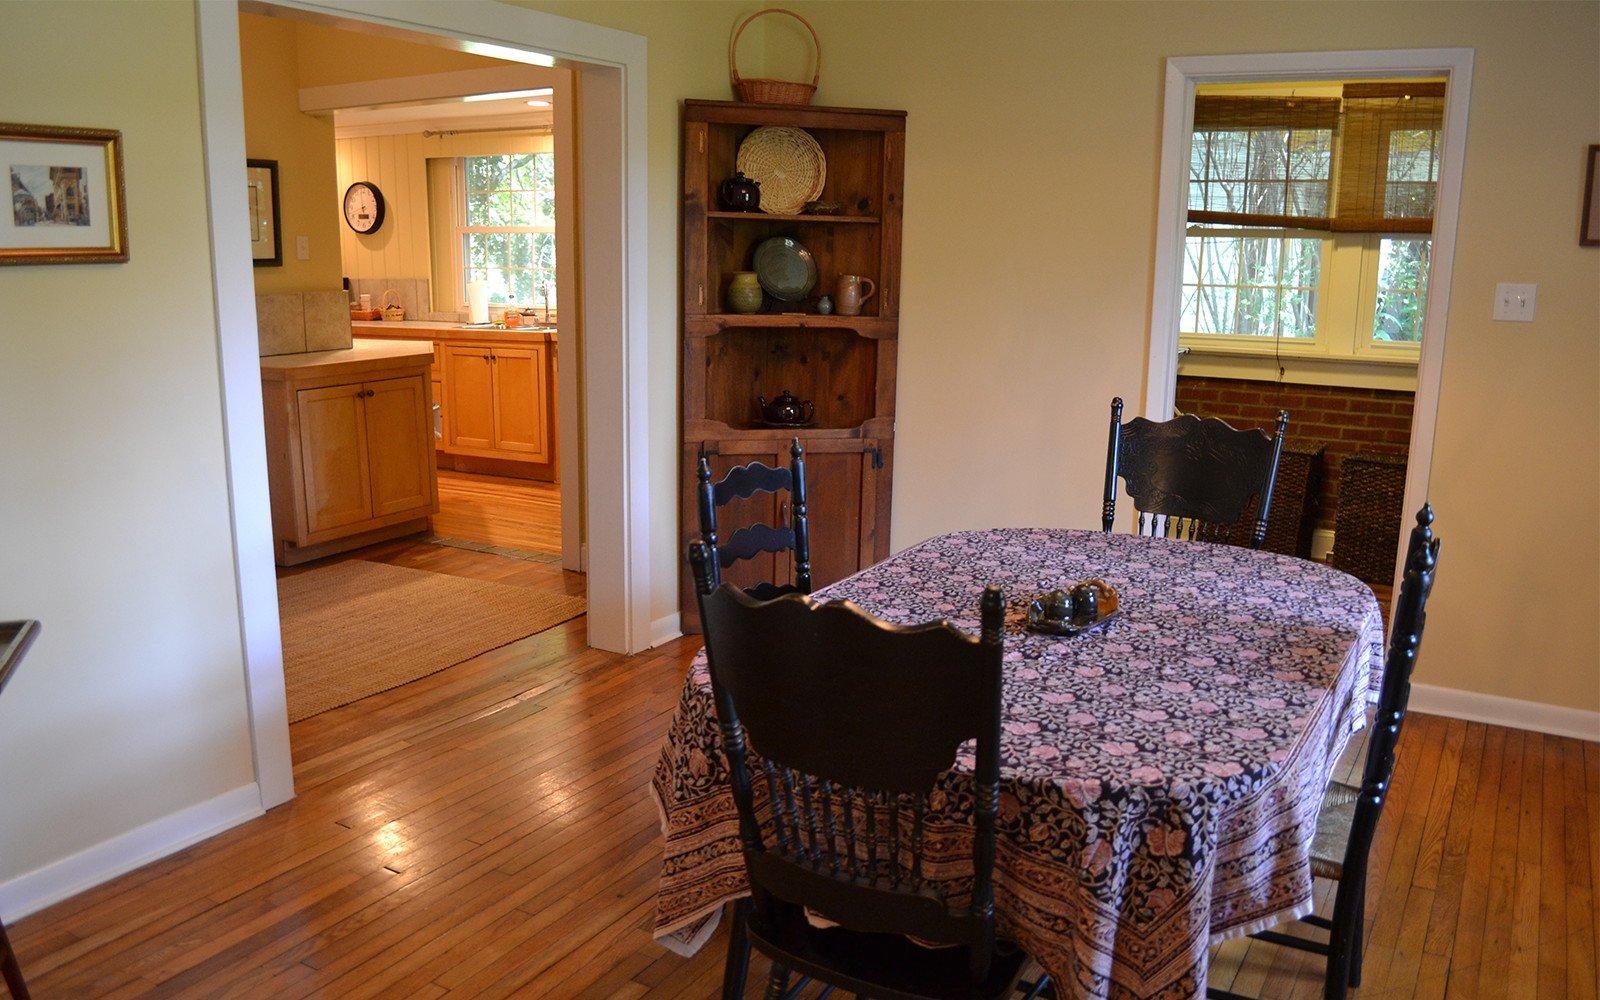 Franklin-Street-house-dining-room